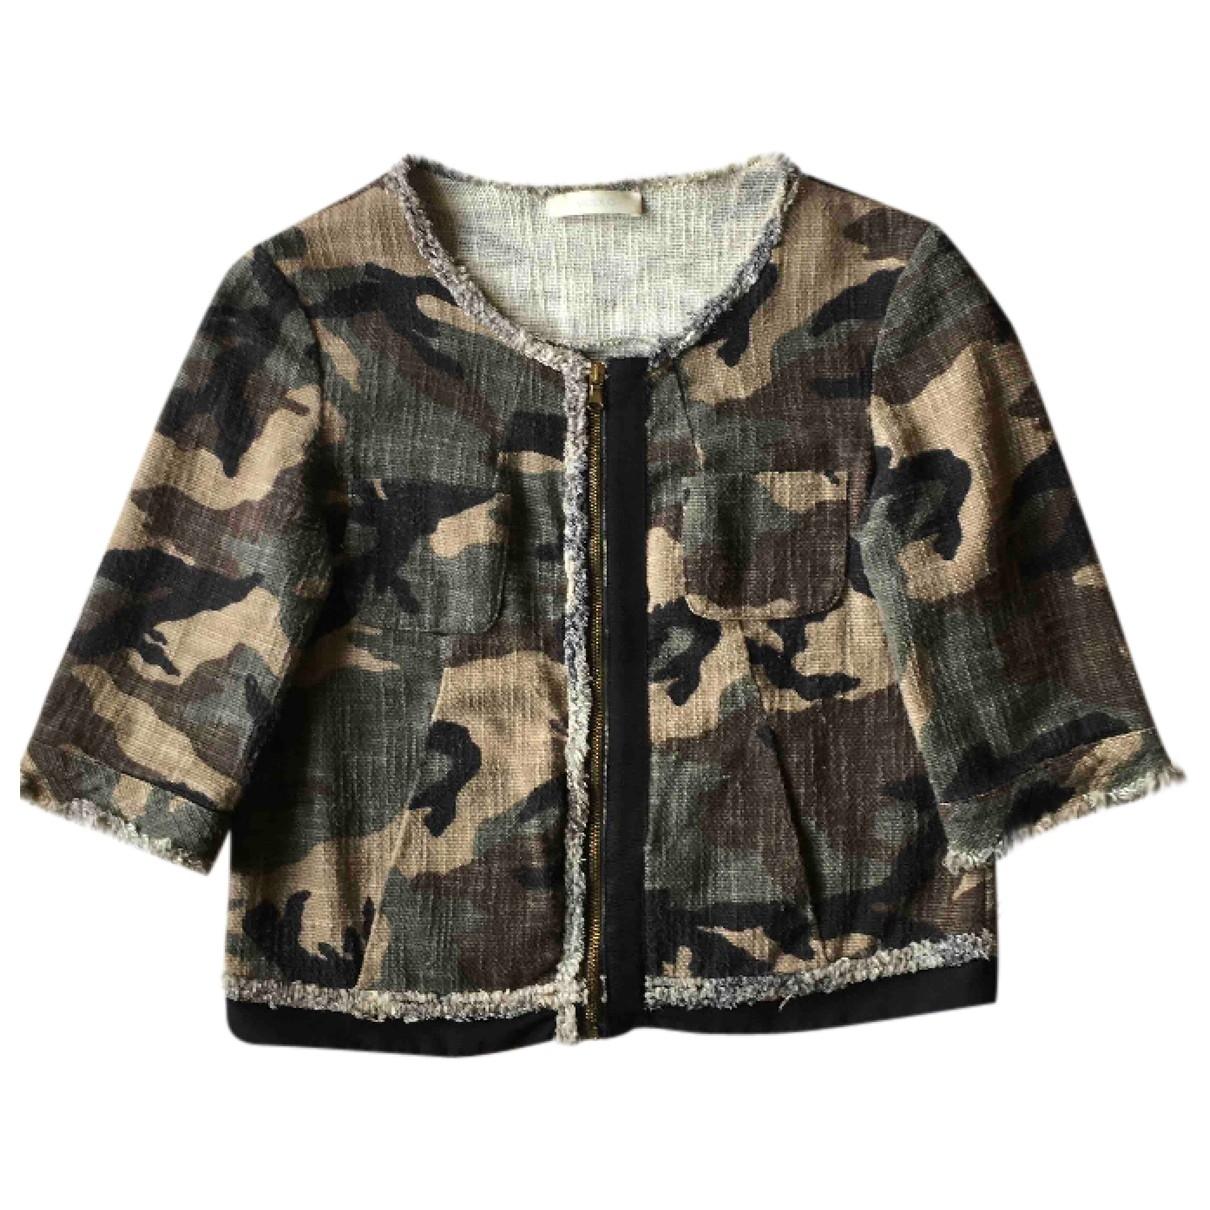 Vicolo \N Multicolour Cotton jacket for Women 42 IT